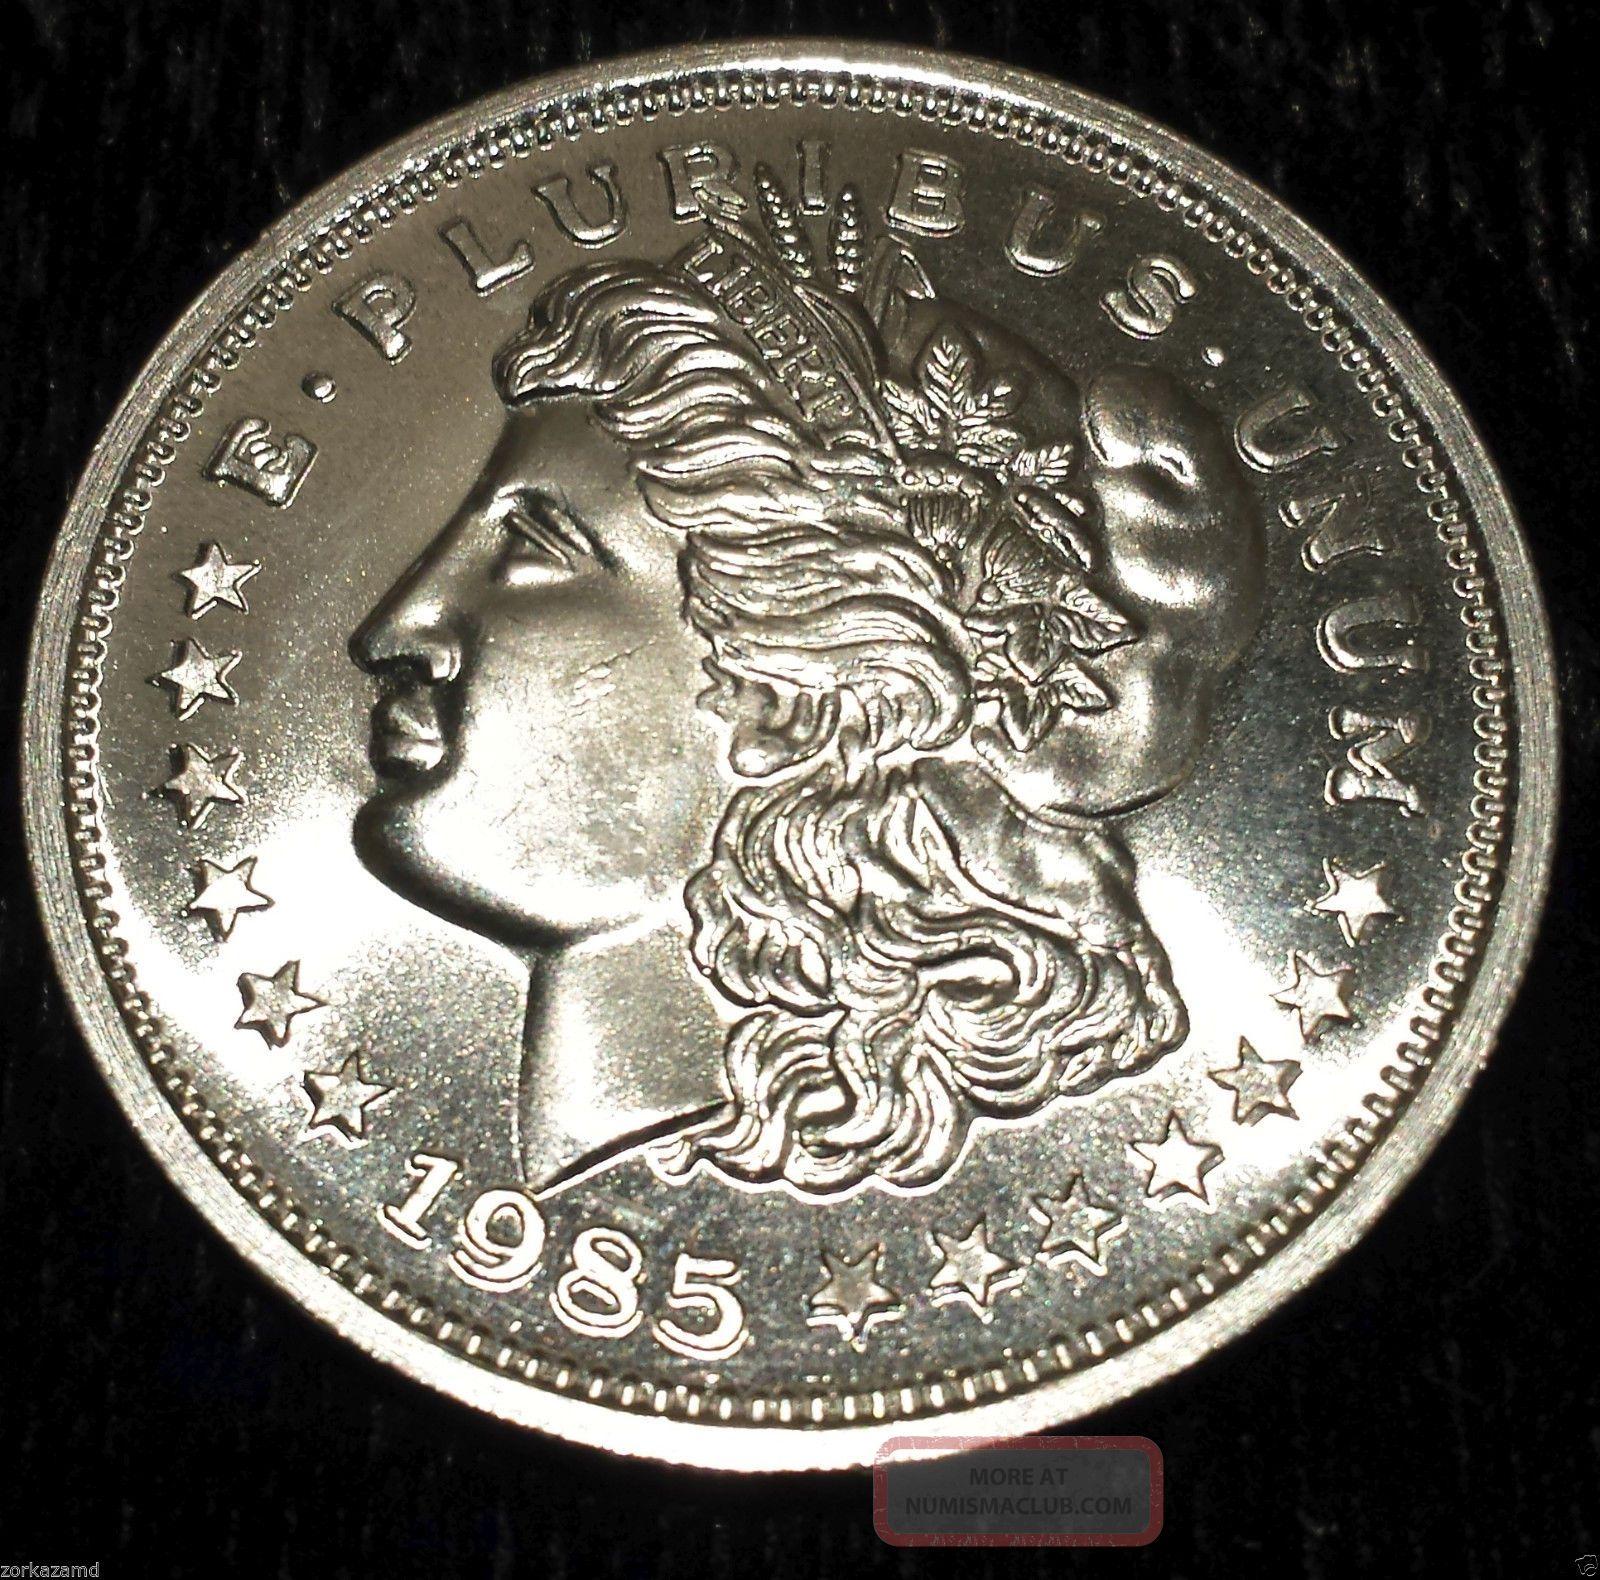 1985 Morgan 1 Troy Oz 999 Fine Silver Trade Unit Wtu26